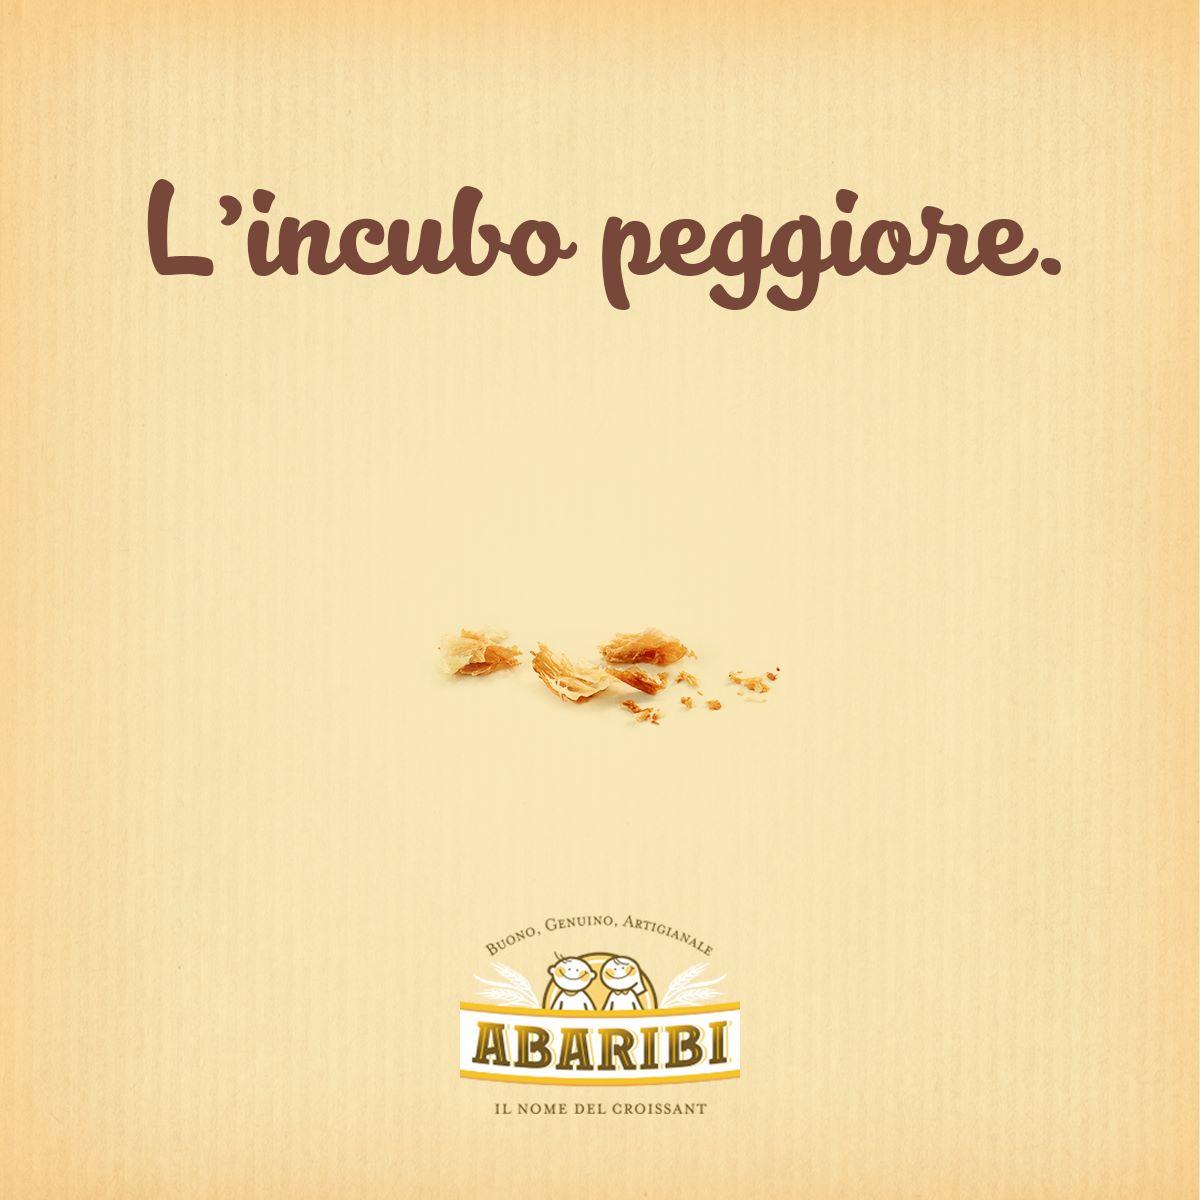 Post Abaribi Facebook